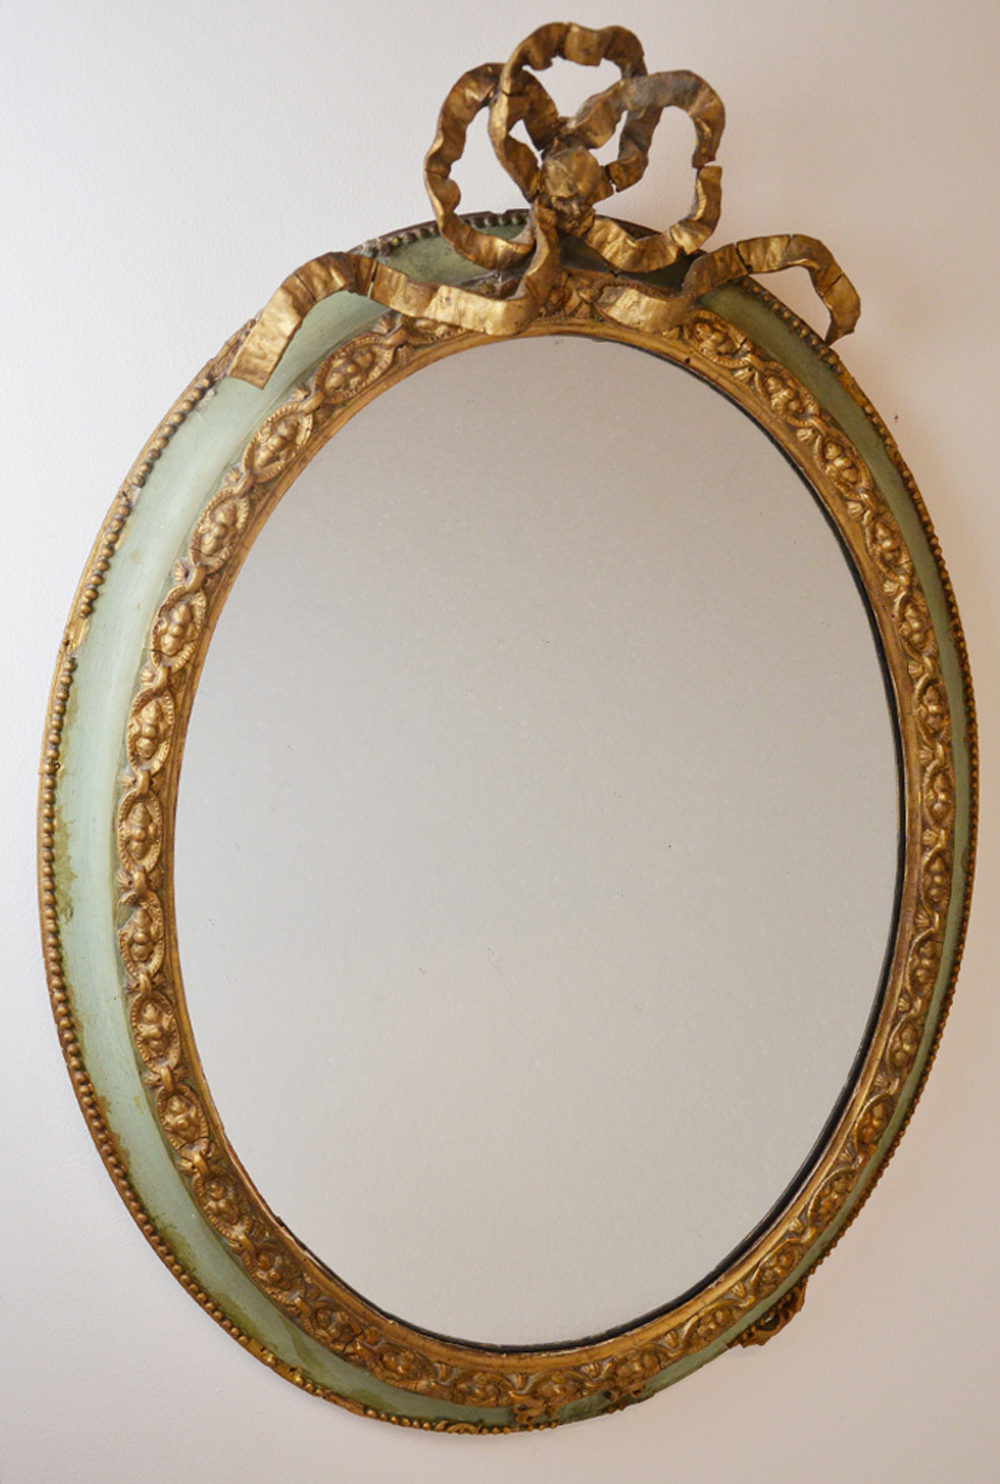 Contemporary Silver Mirrored Wall Mirror | Contemporary